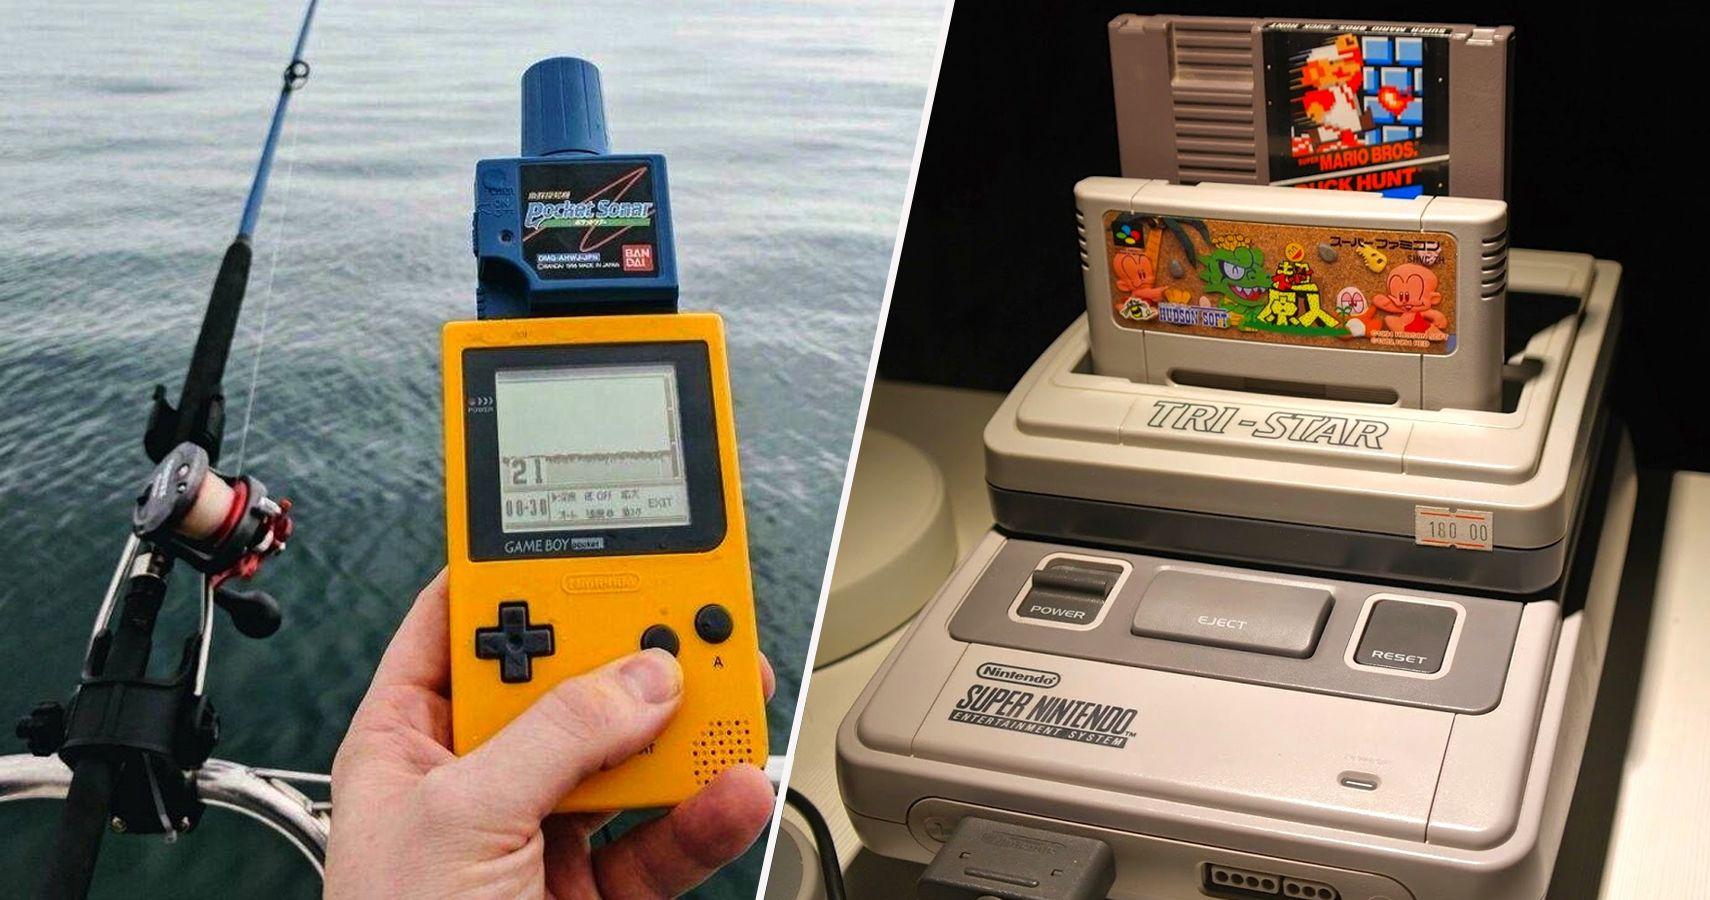 world of Game Boy add-ons